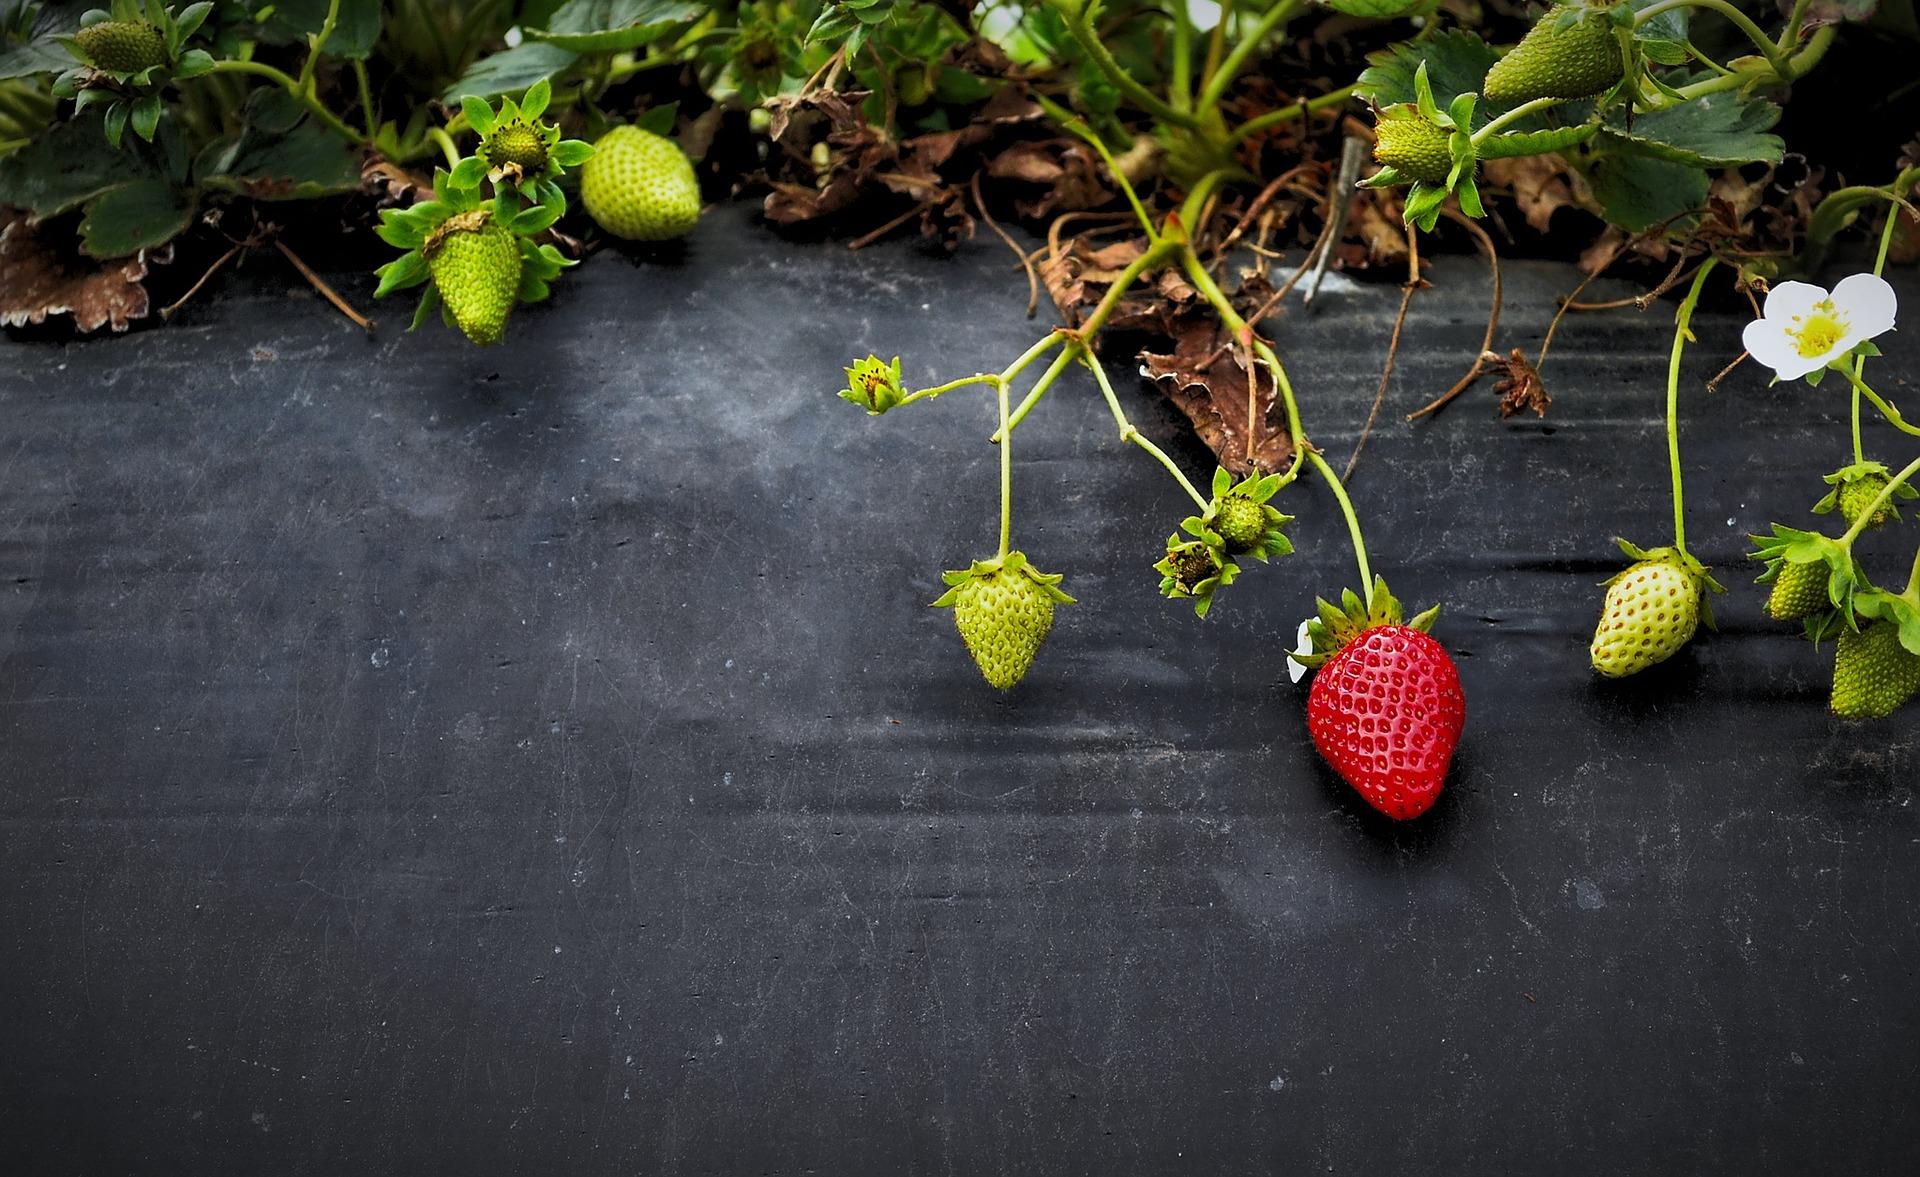 strawberries-g864d63c51_1920